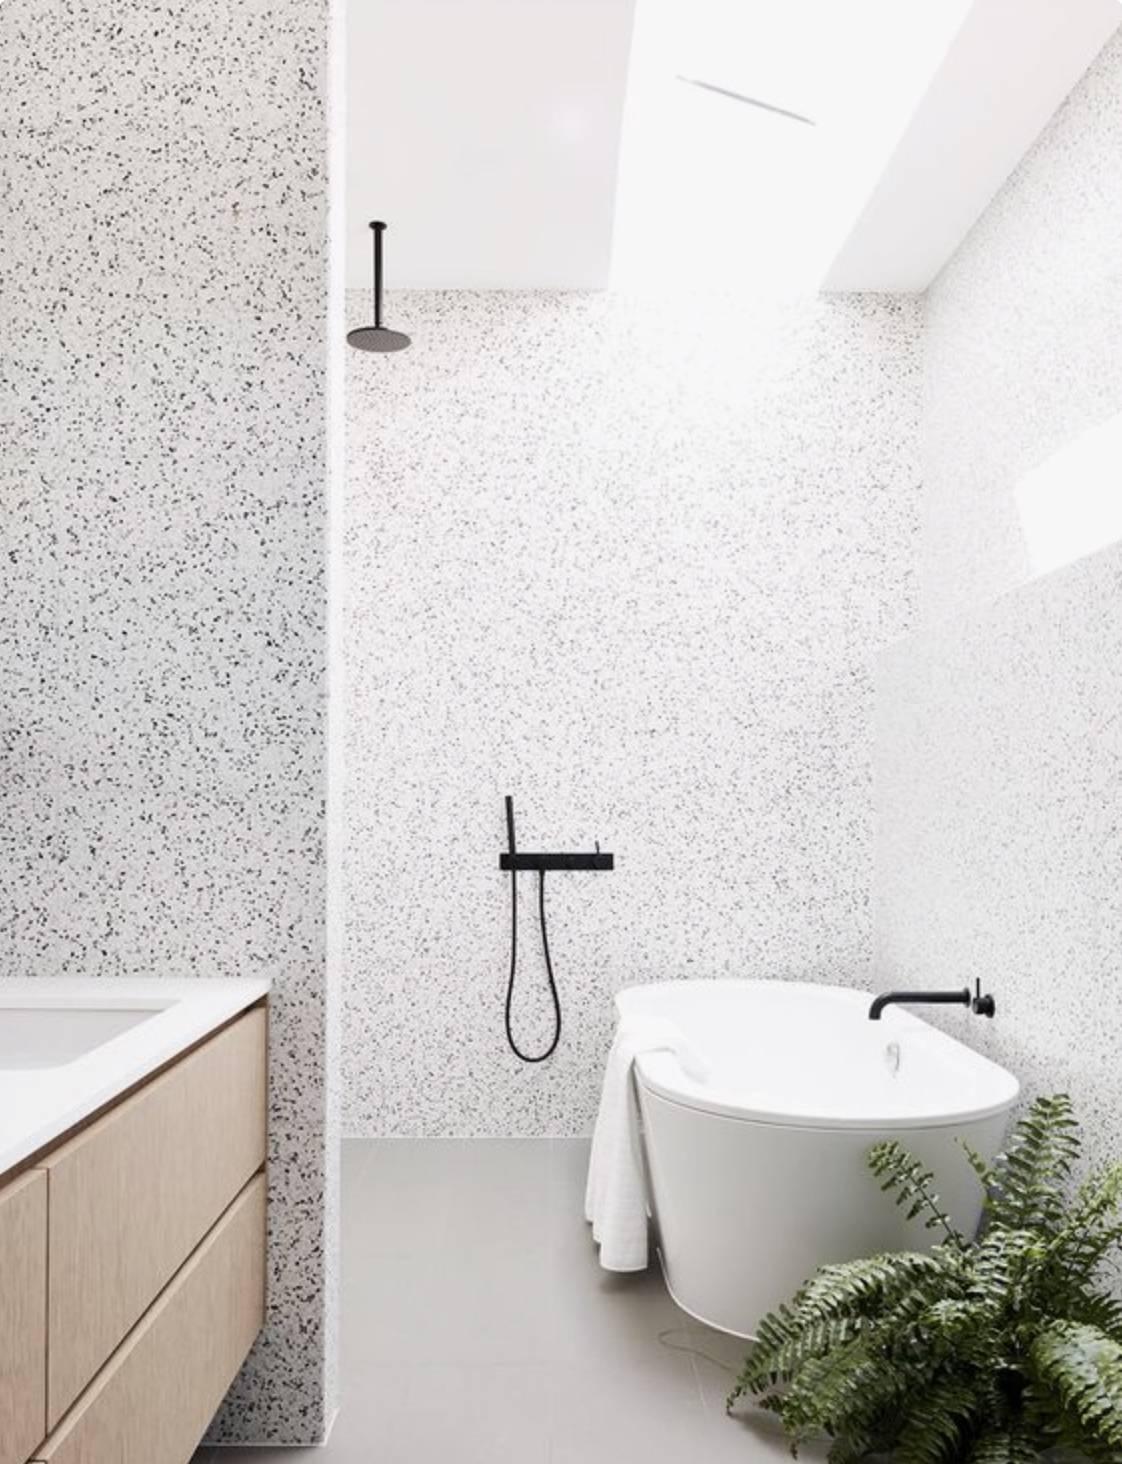 Fabricant de carrelage travertin pour salle de bain Luxembourg ...